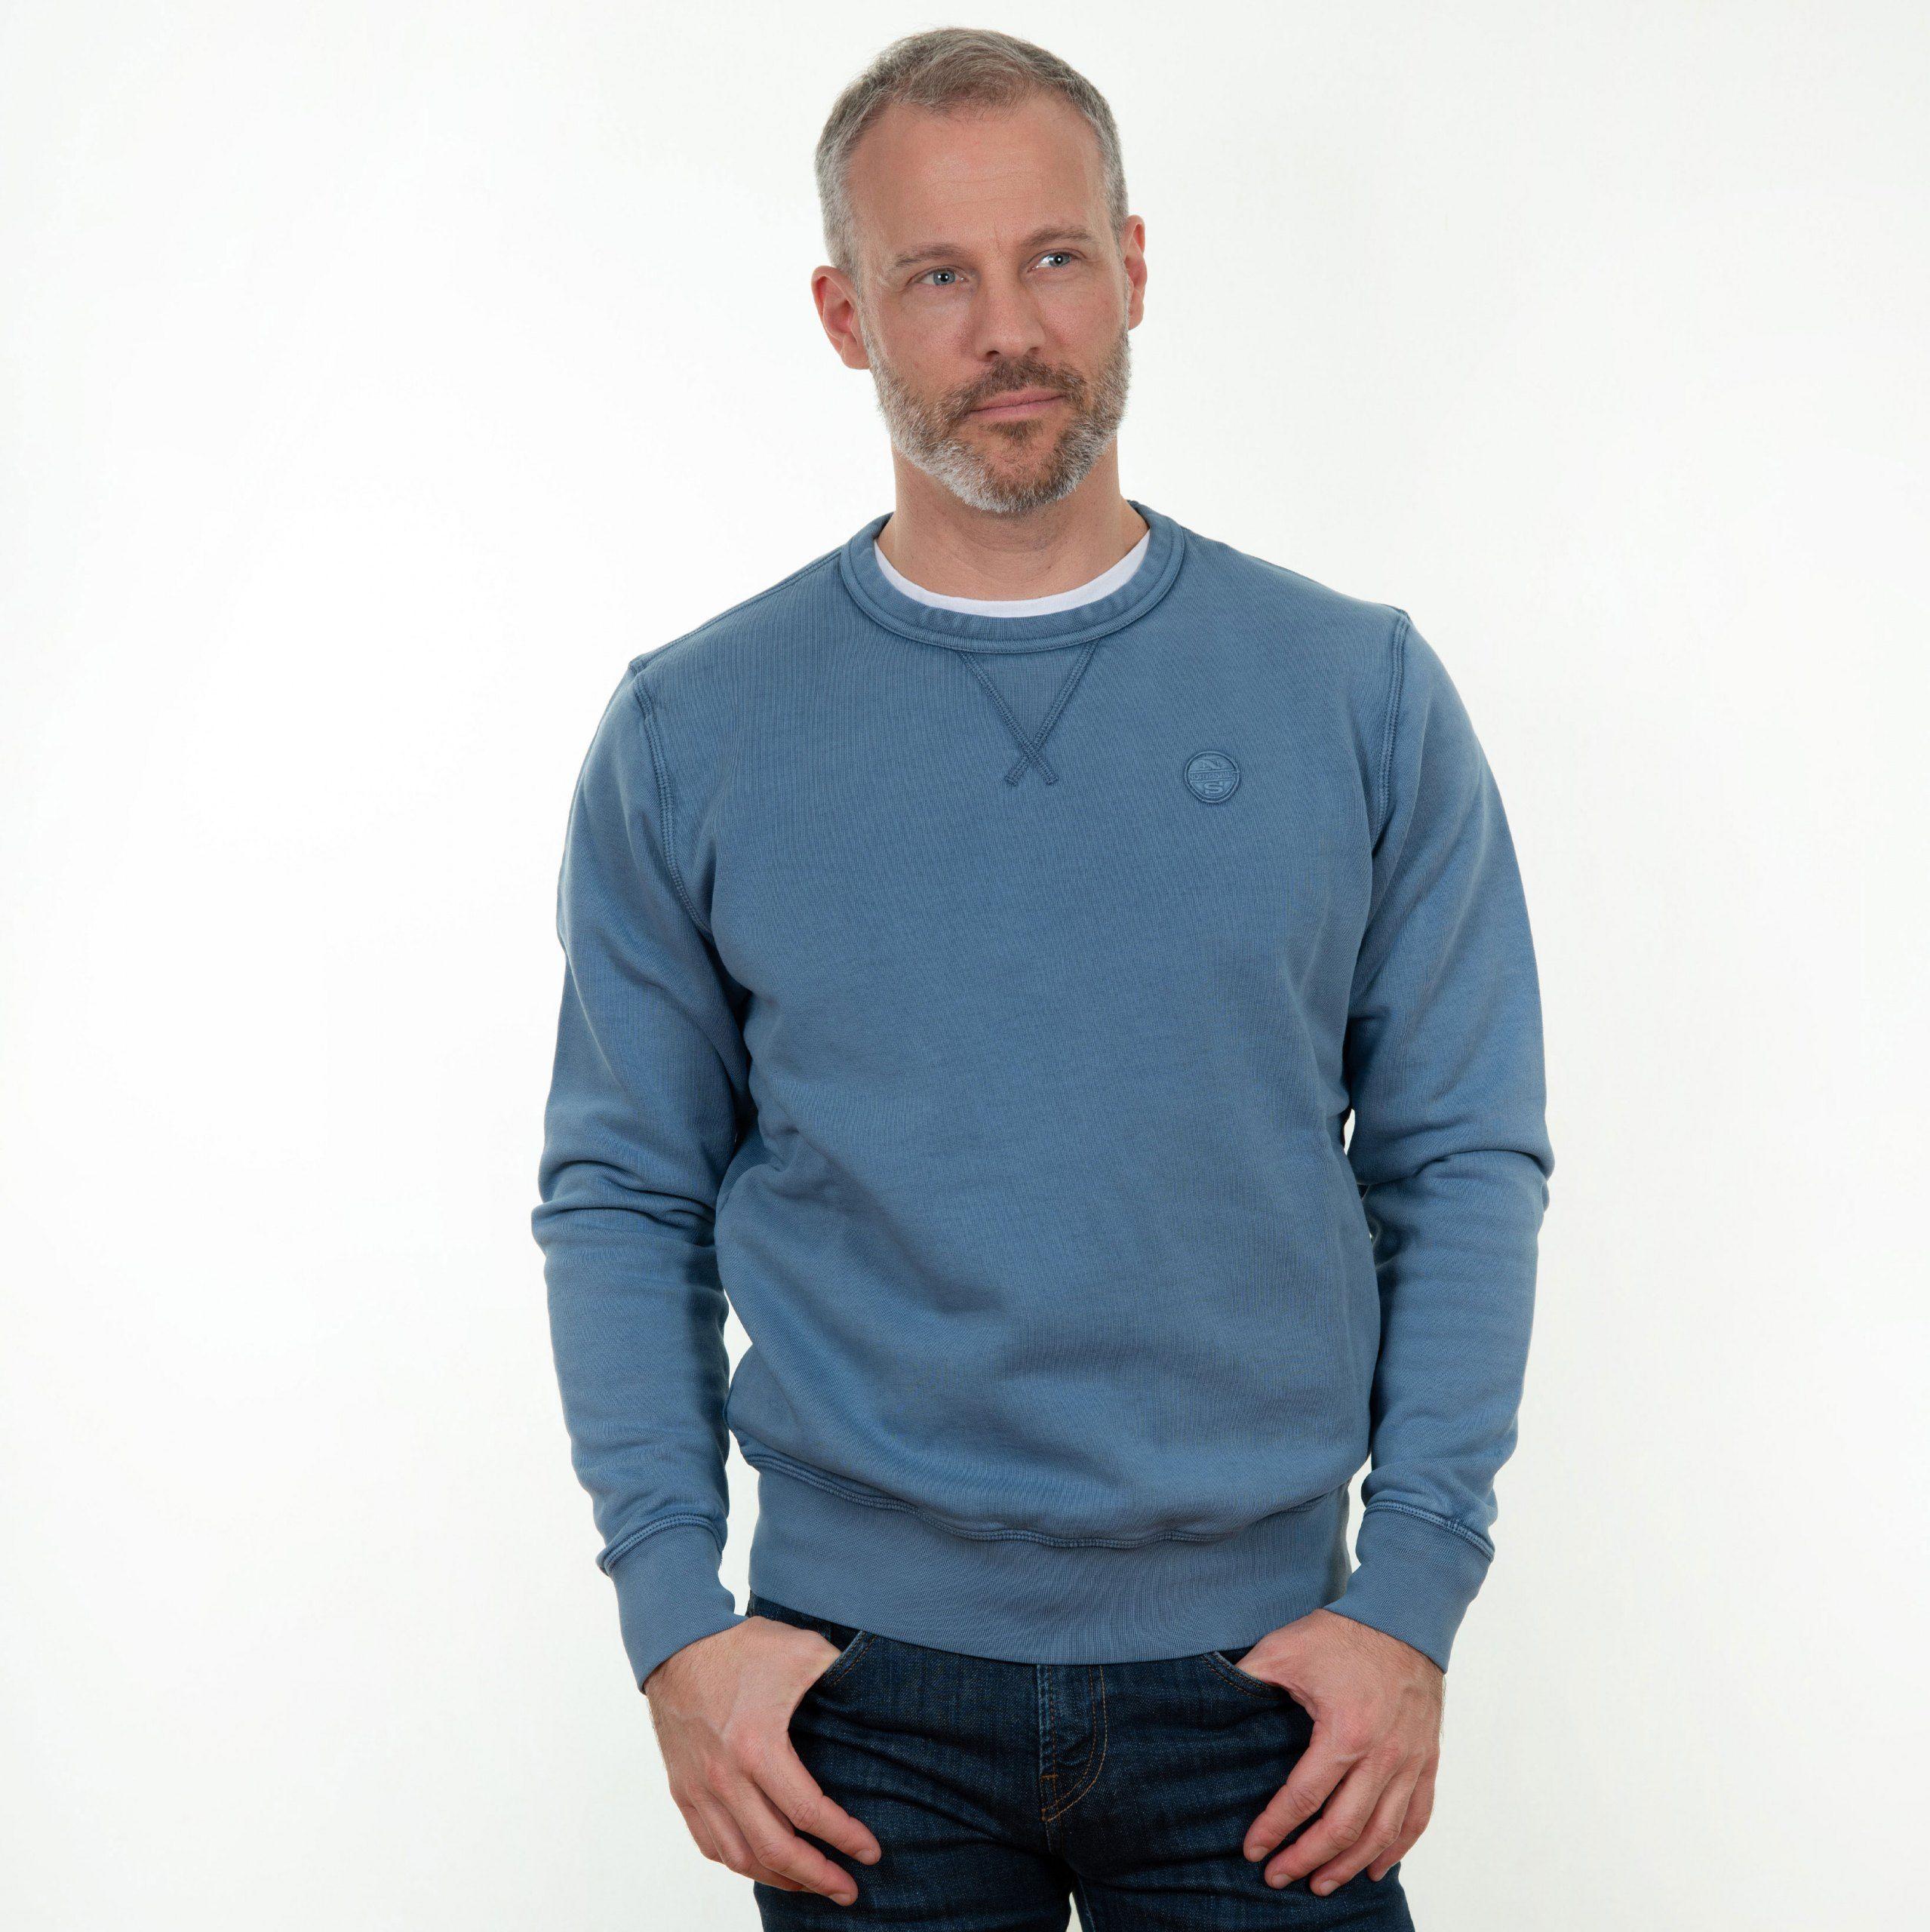 Poloshow North Sails Sweatshirt Jeans 691547 000 0790 500 8